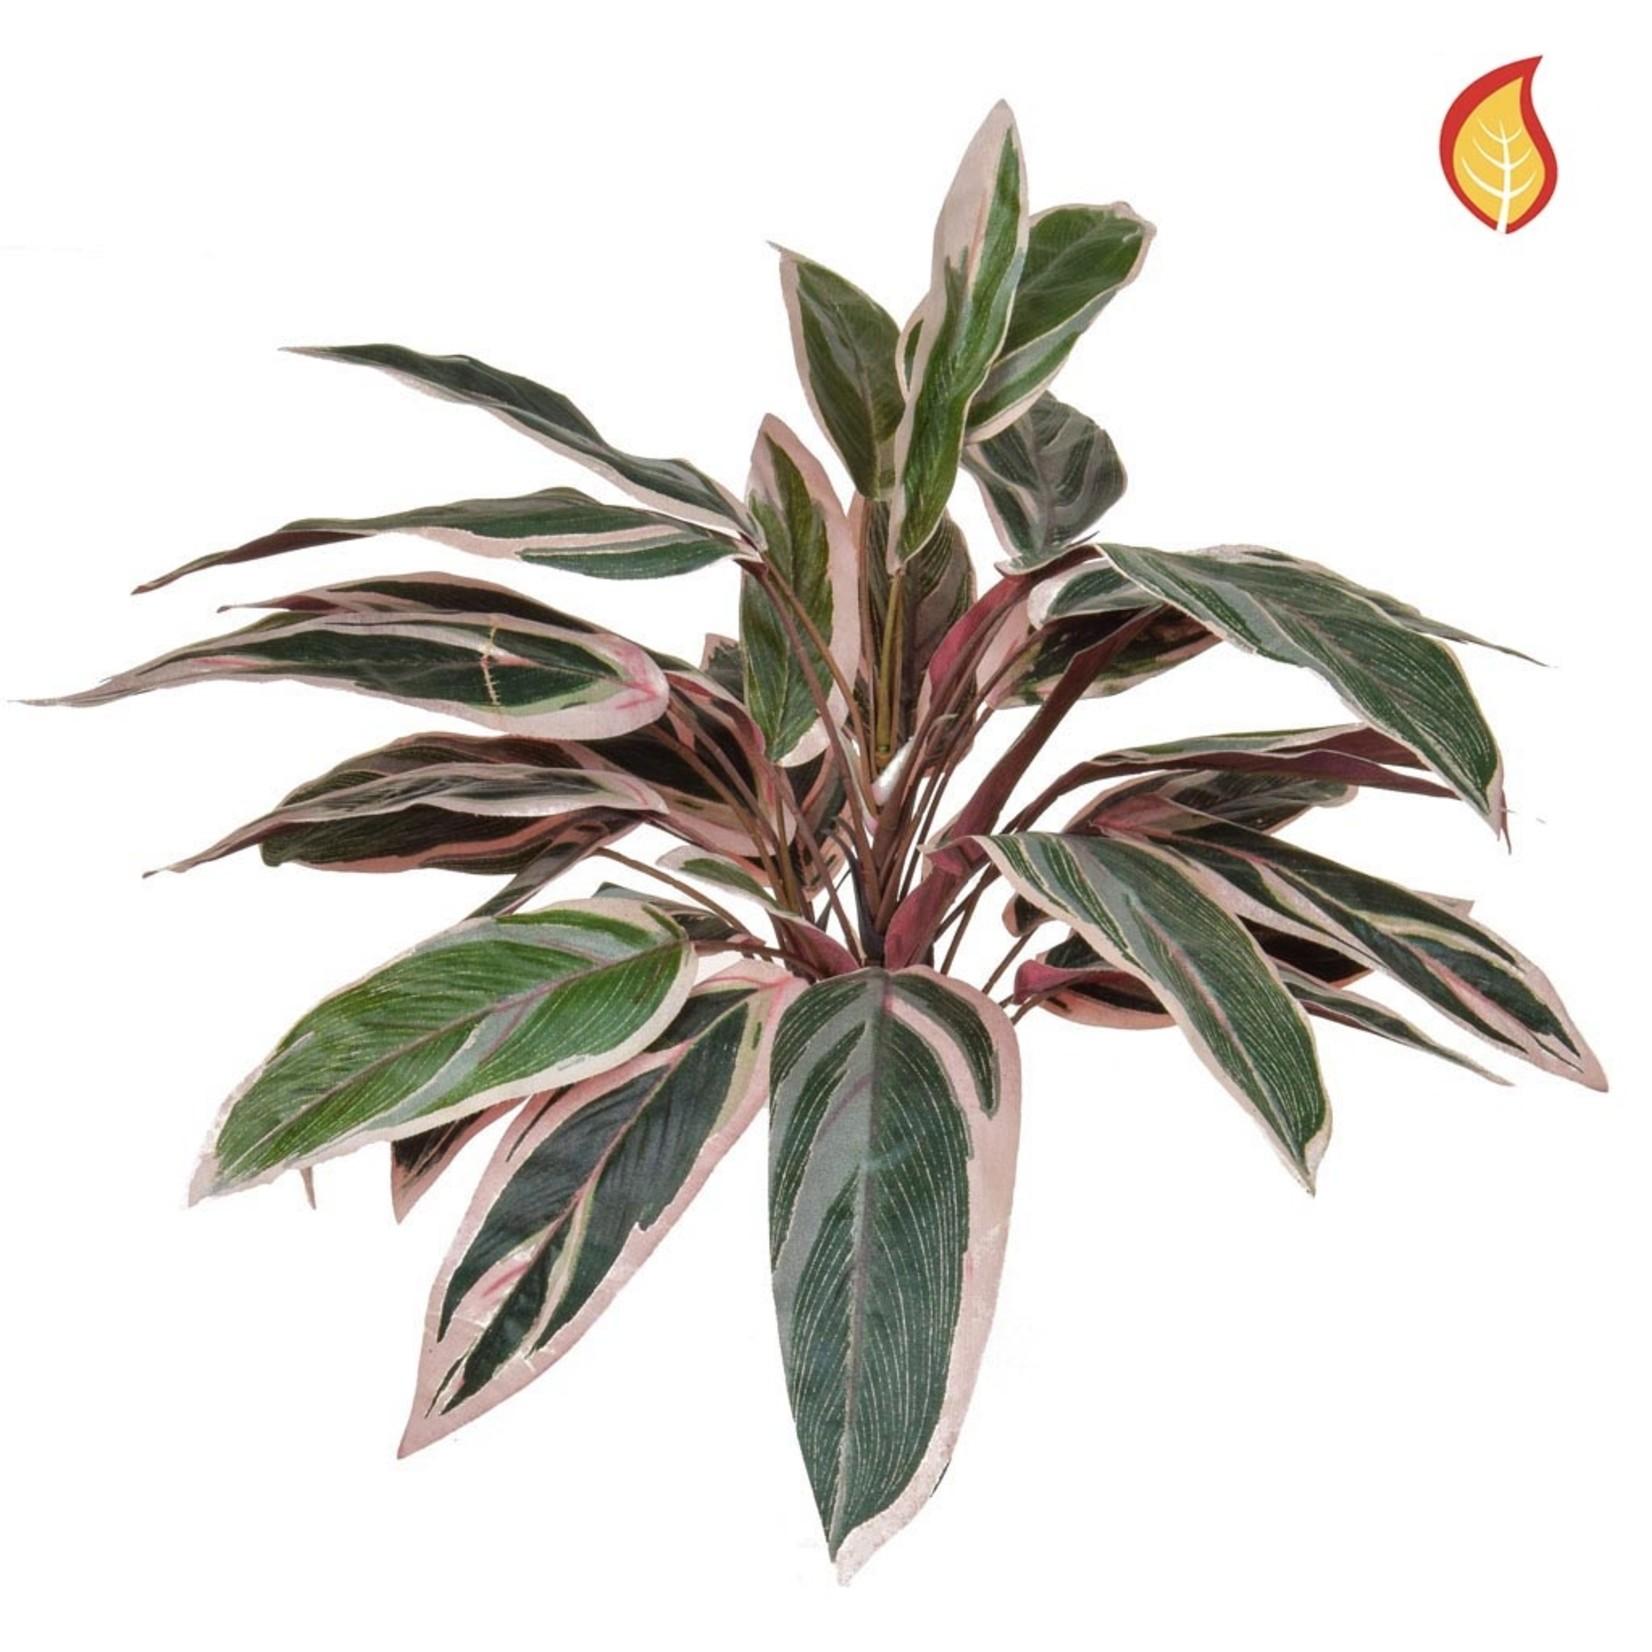 Plants Base Caladium Bush 40cm  - Fire Rated